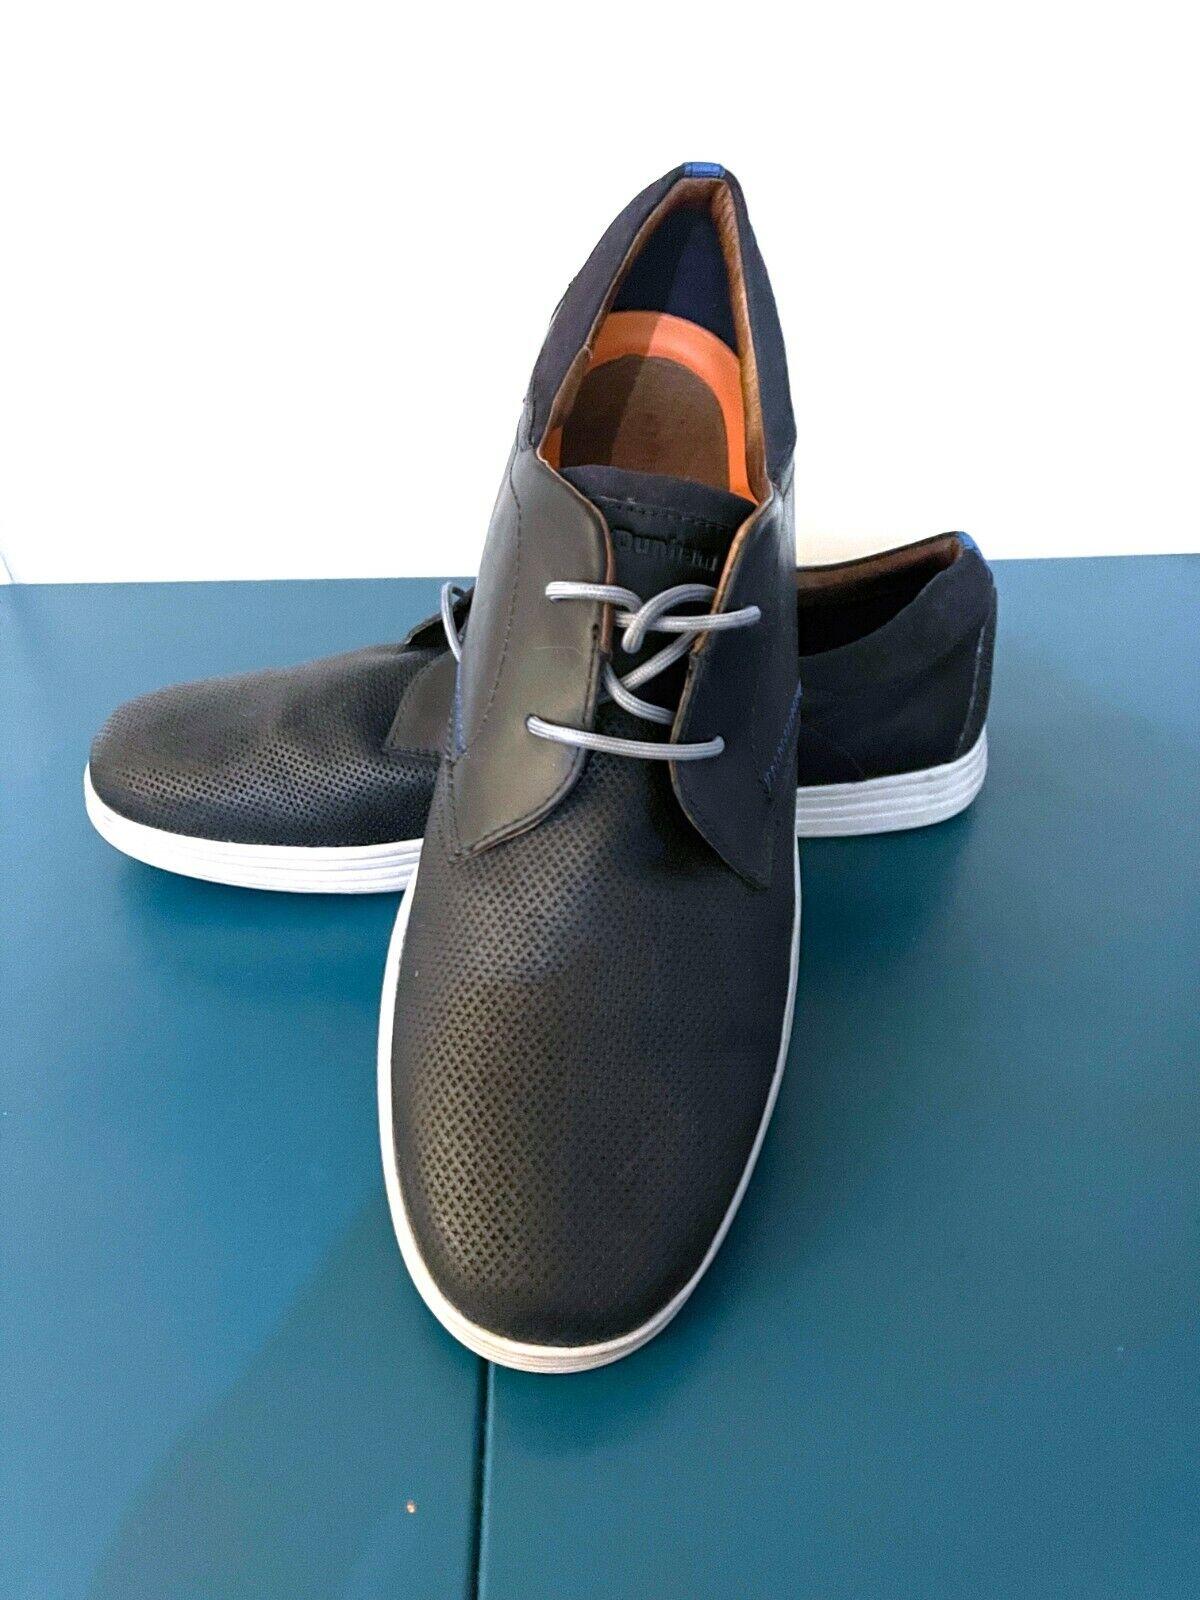 Dunham Mens Casual Shoes Leather Oxfords Colchester Navy Size 16D Model DAH14BL